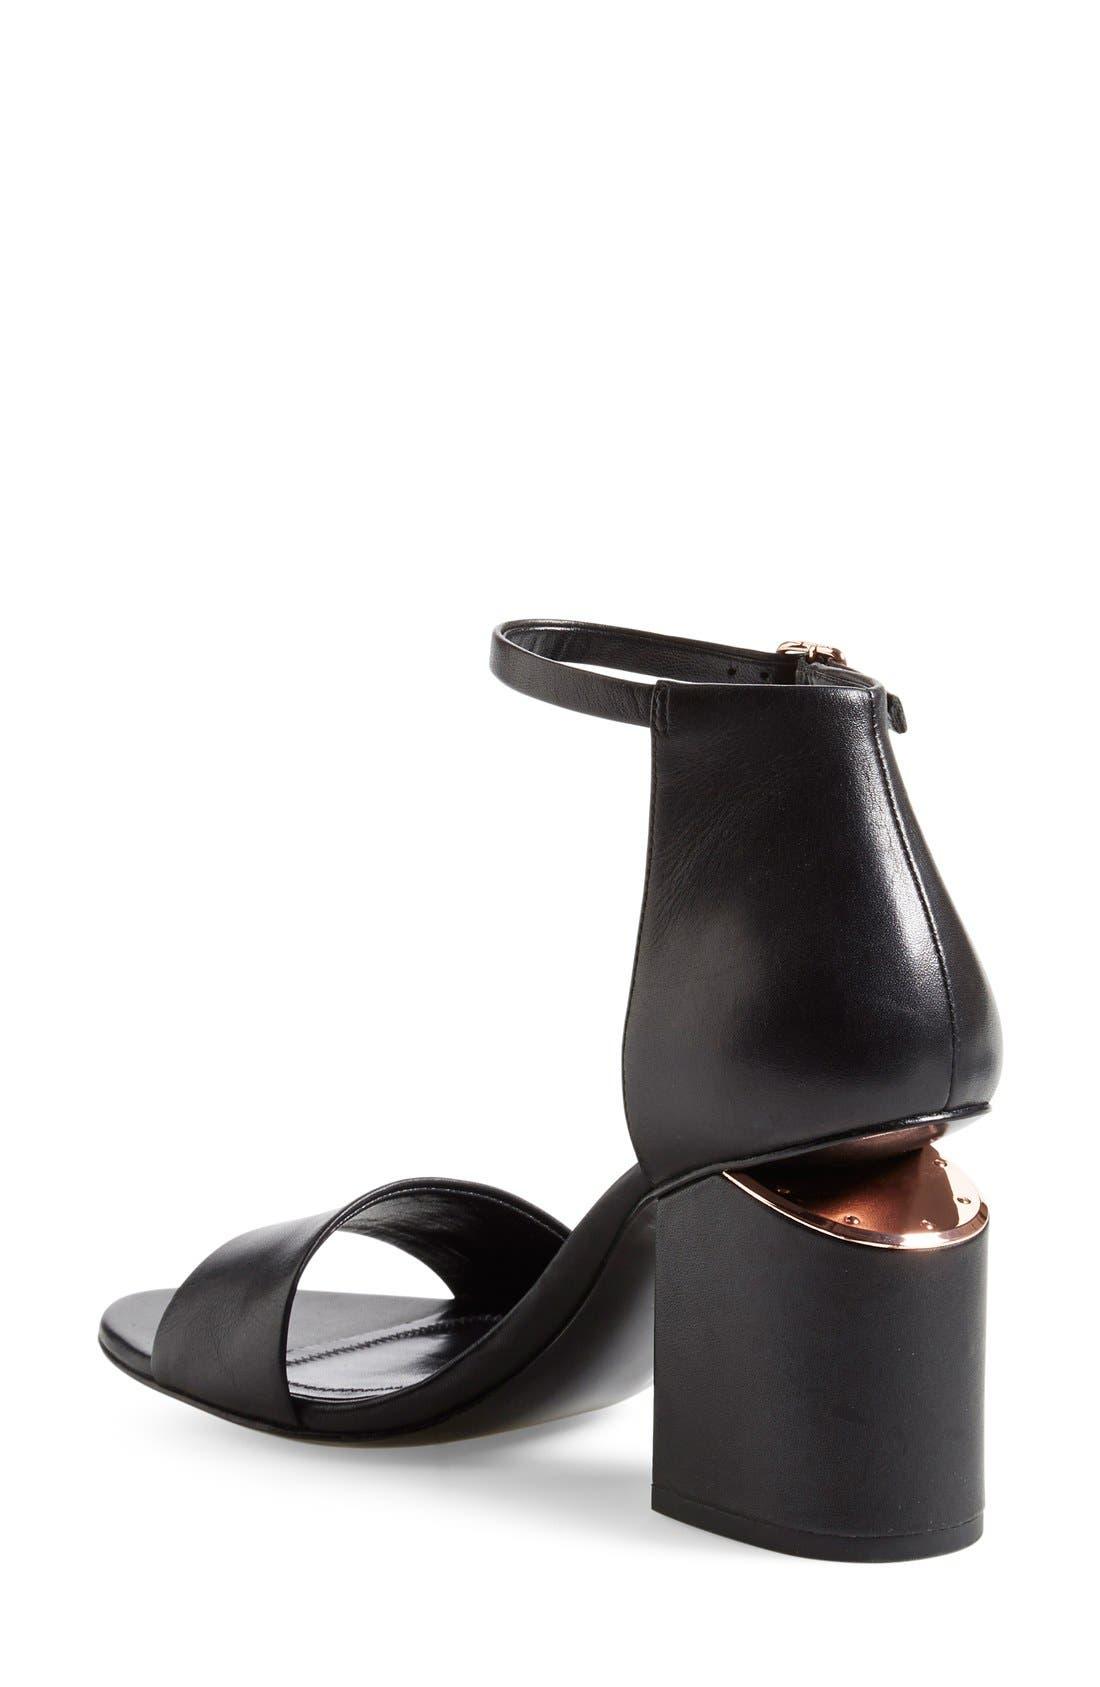 'Abby' Ankle Strap Sandal,                             Alternate thumbnail 6, color,                             BLACK